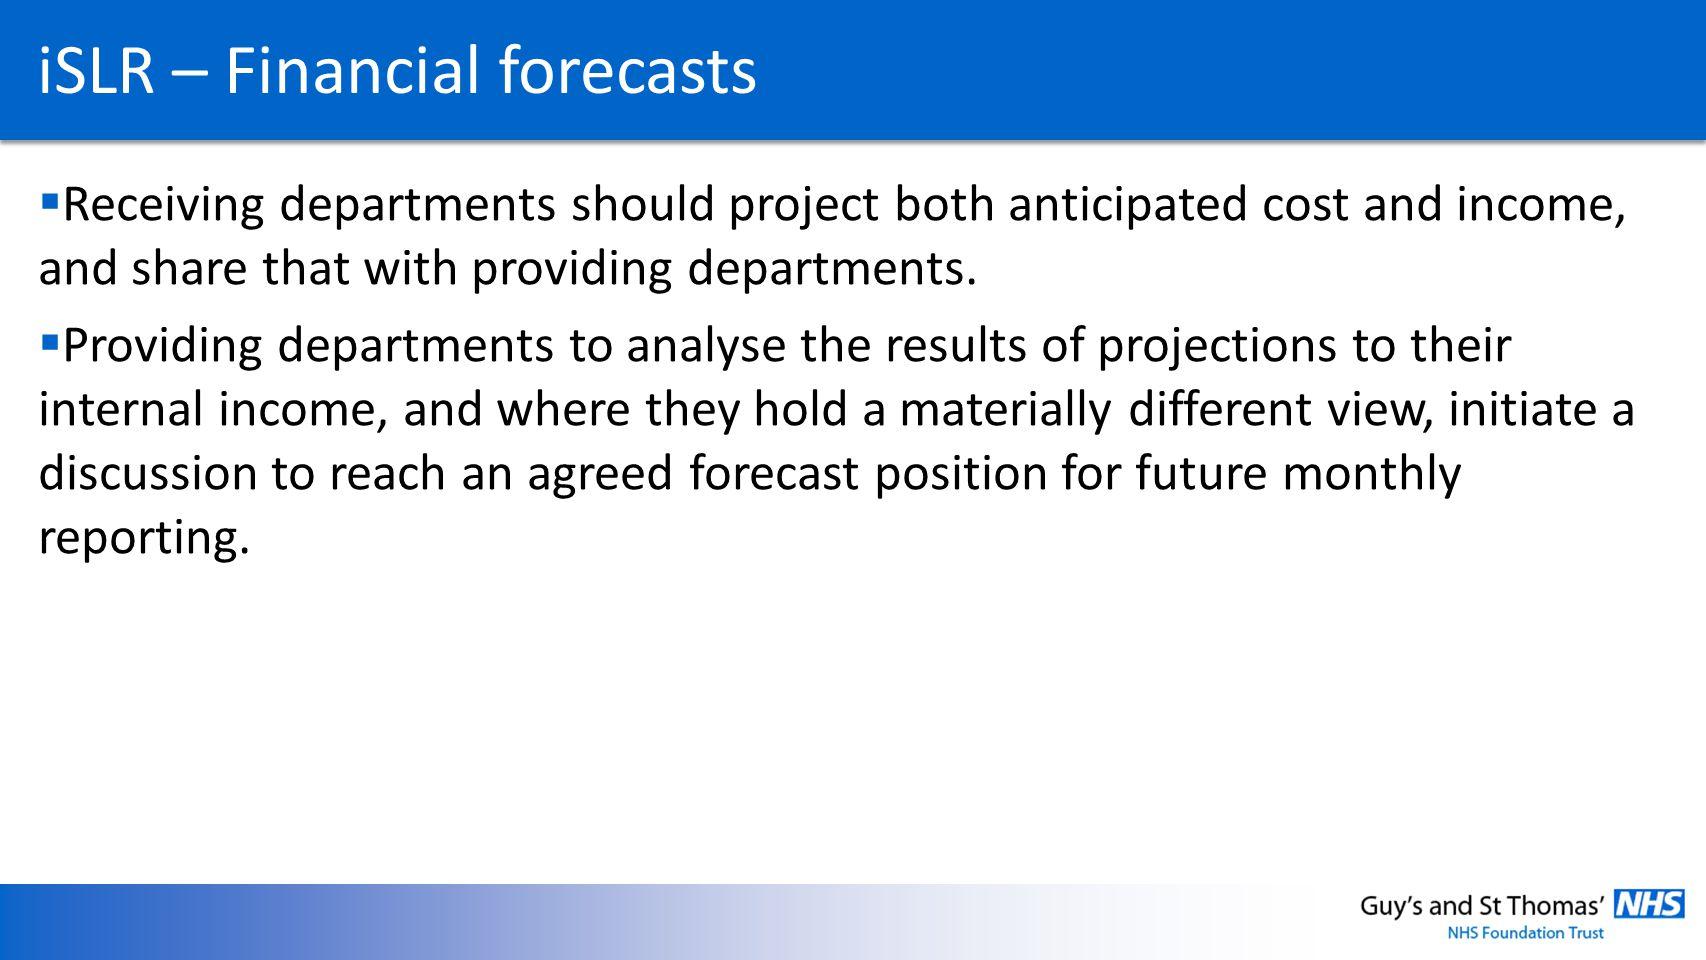 iSLR – Financial forecasts